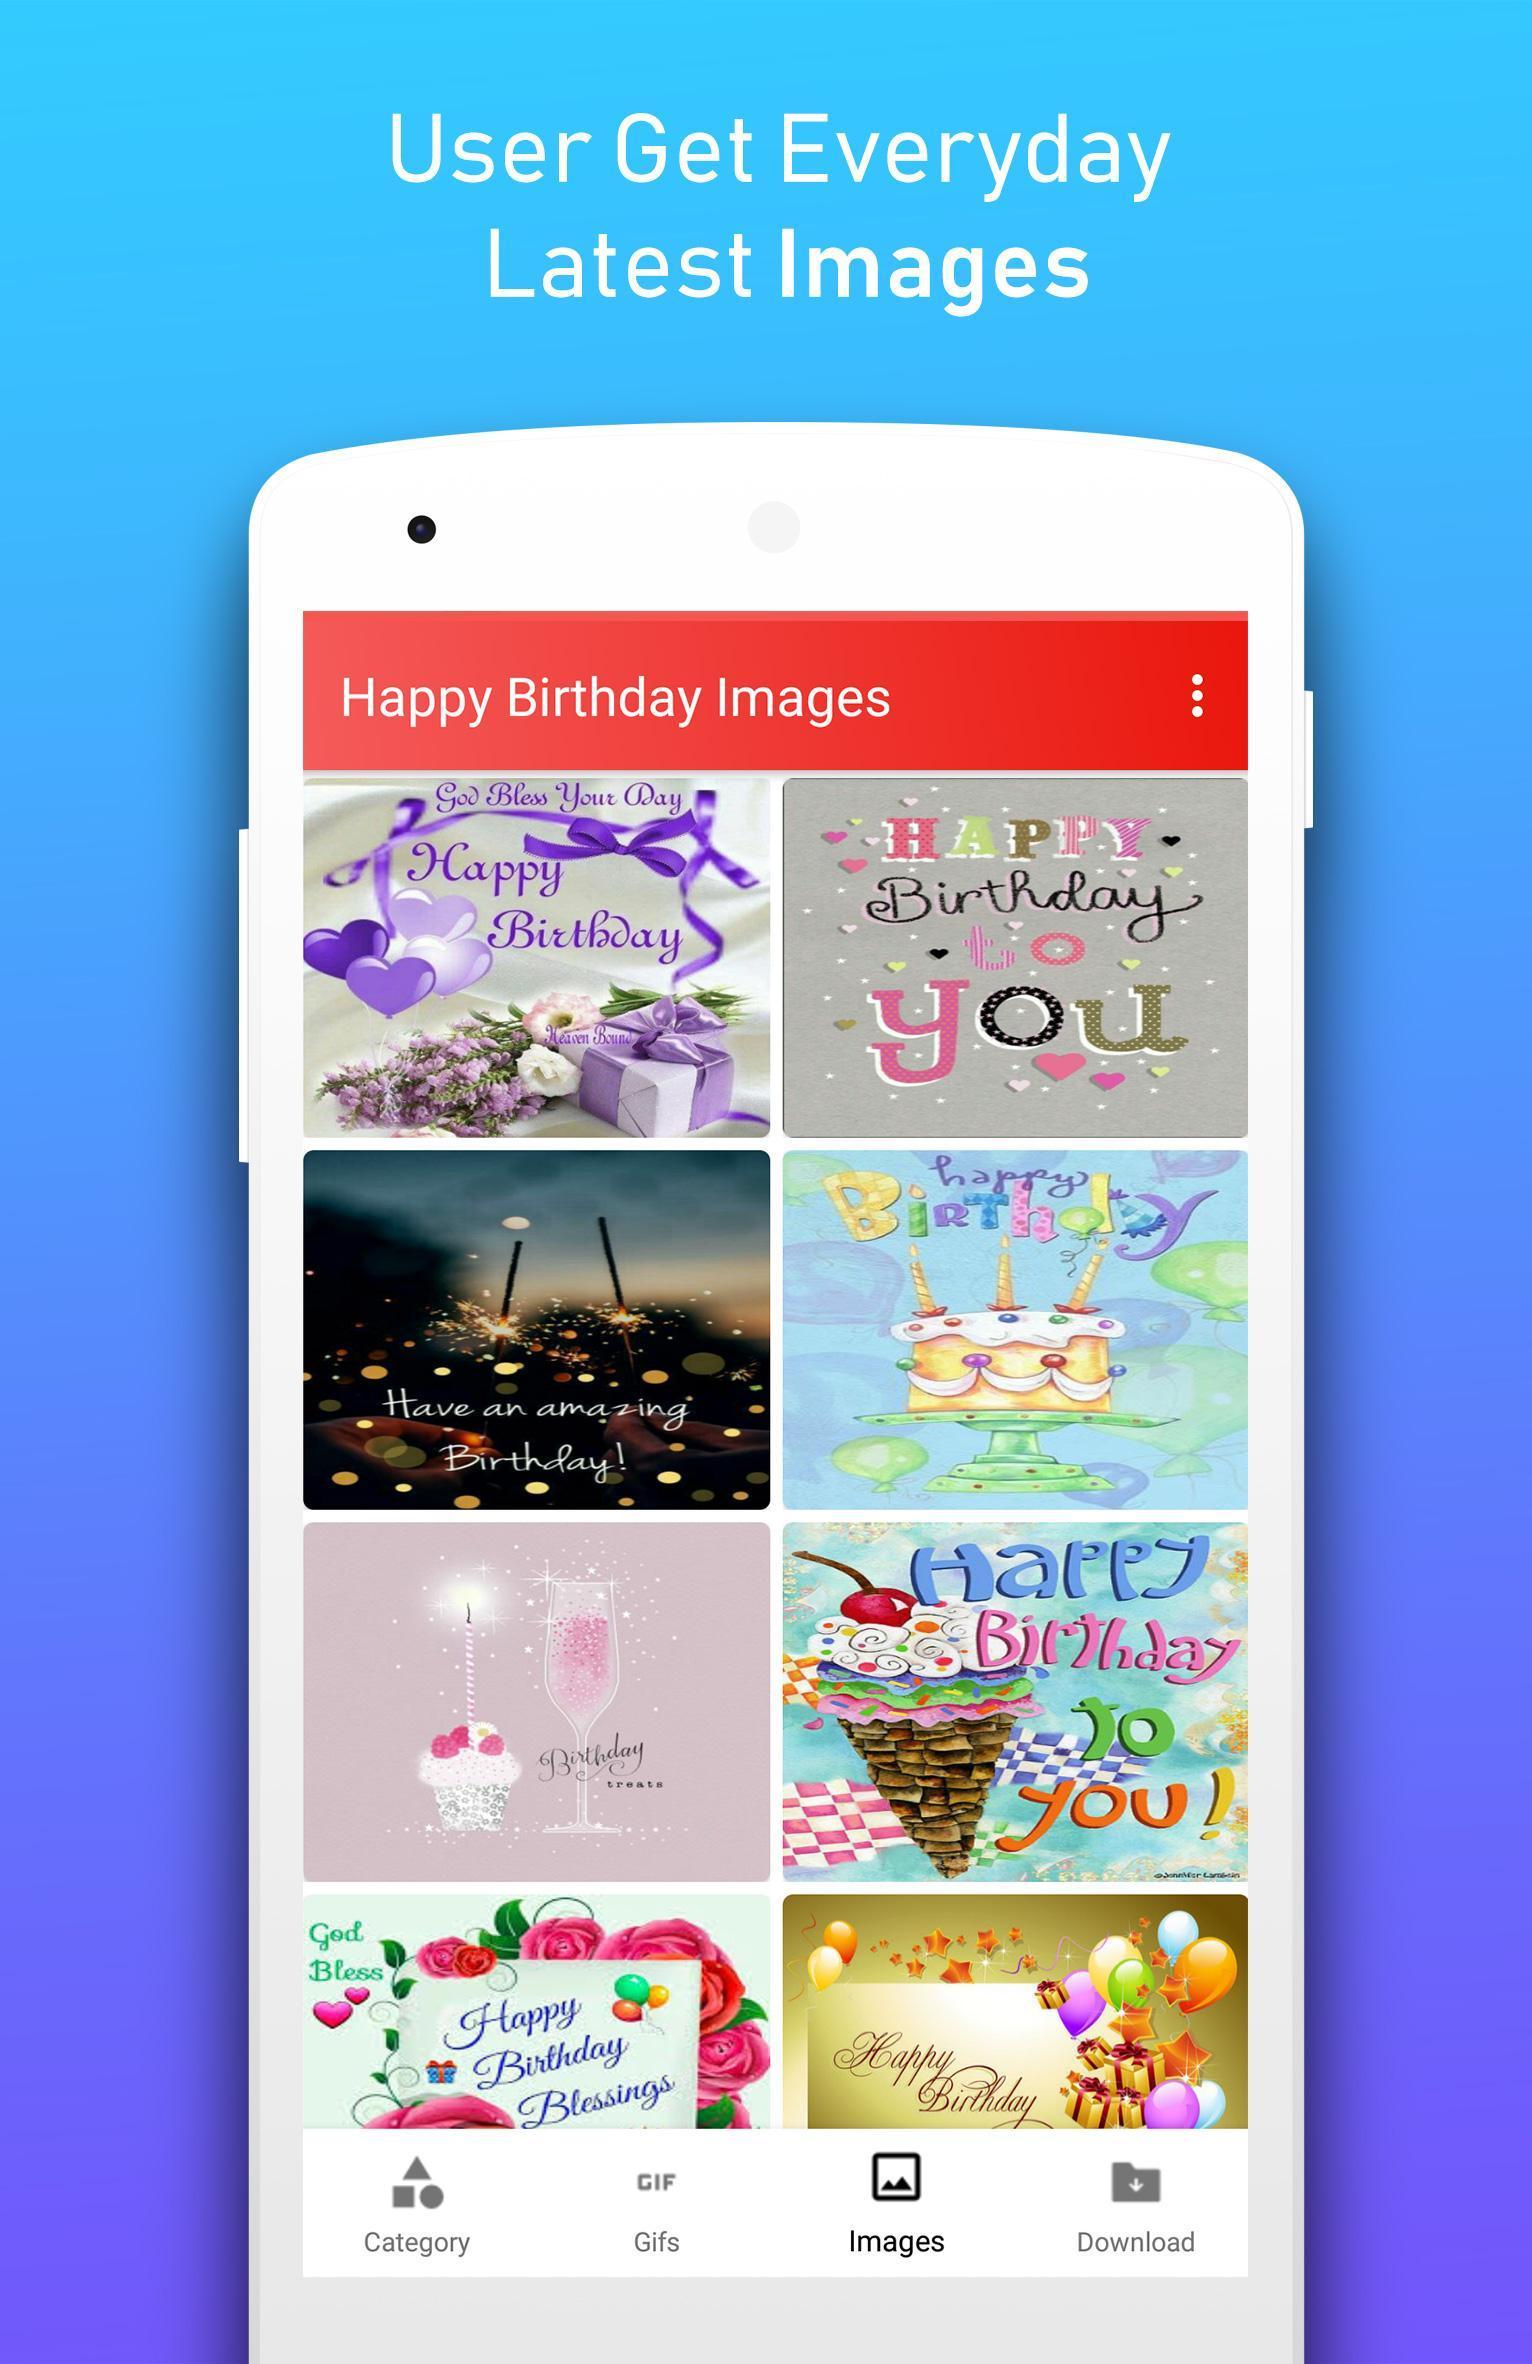 Selamat Ulang Tahun Gif For Android Apk Download